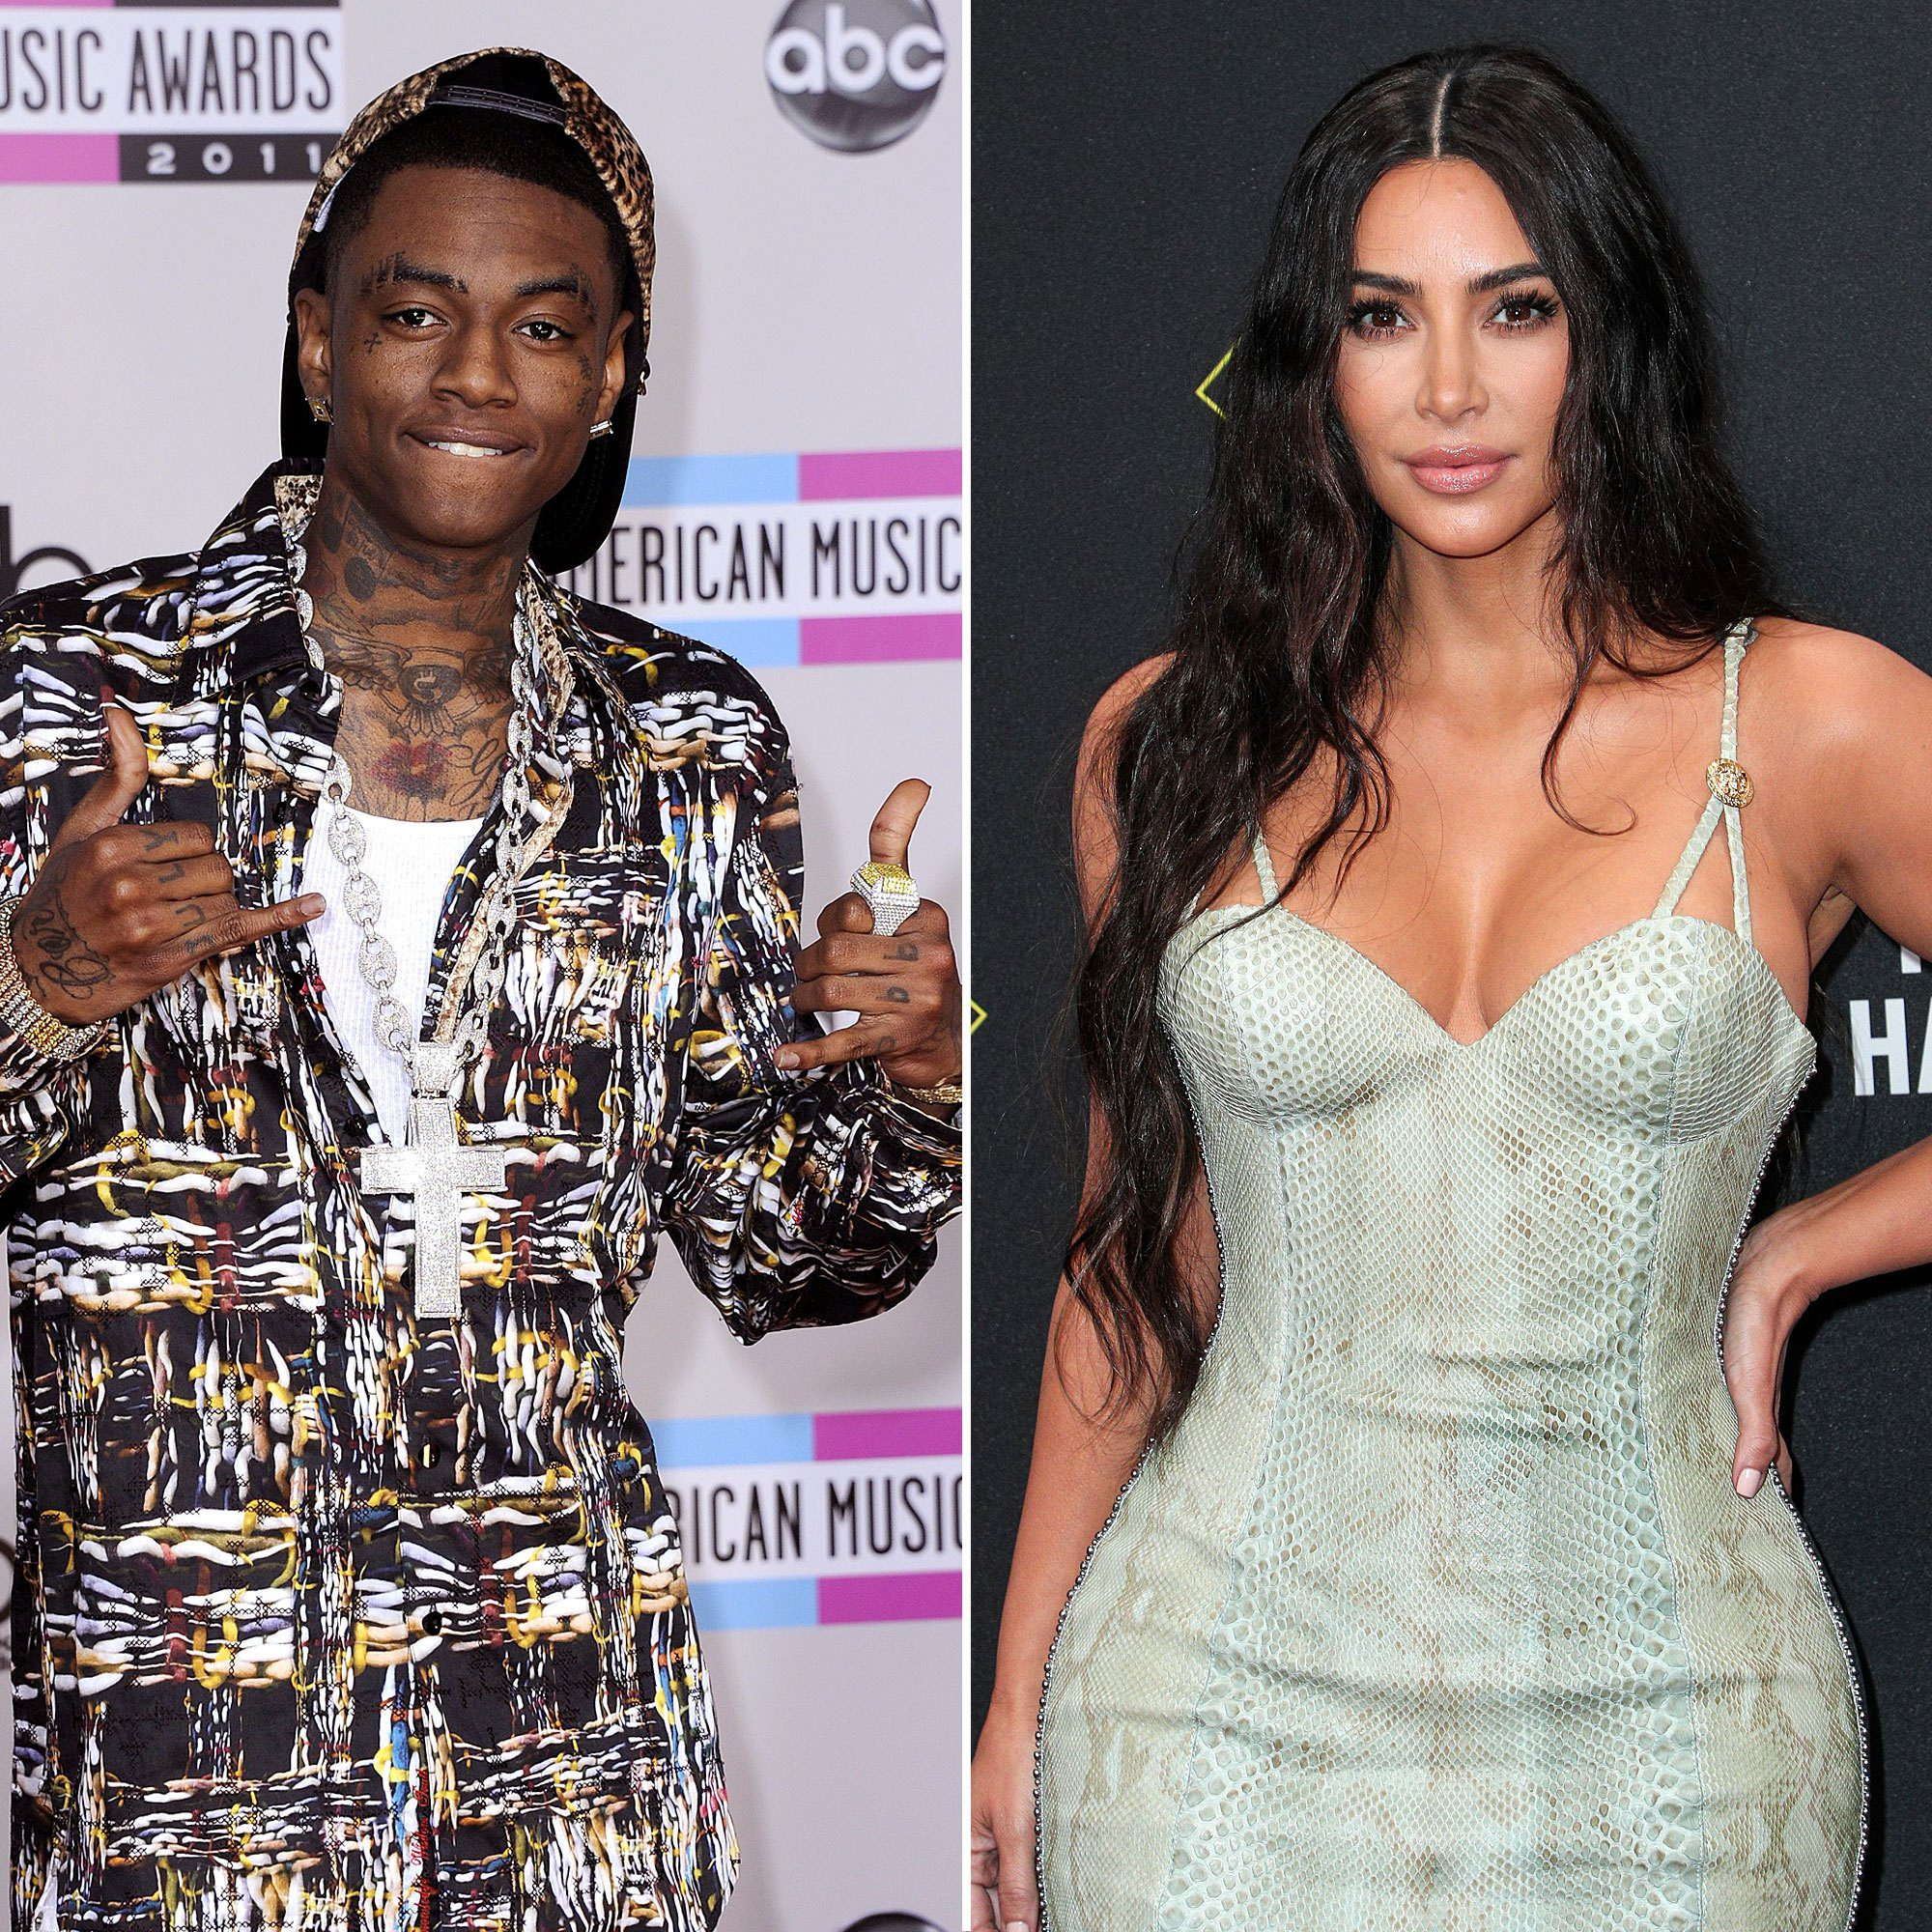 Soulja Boy Kim Kardashian dating photo explanation.